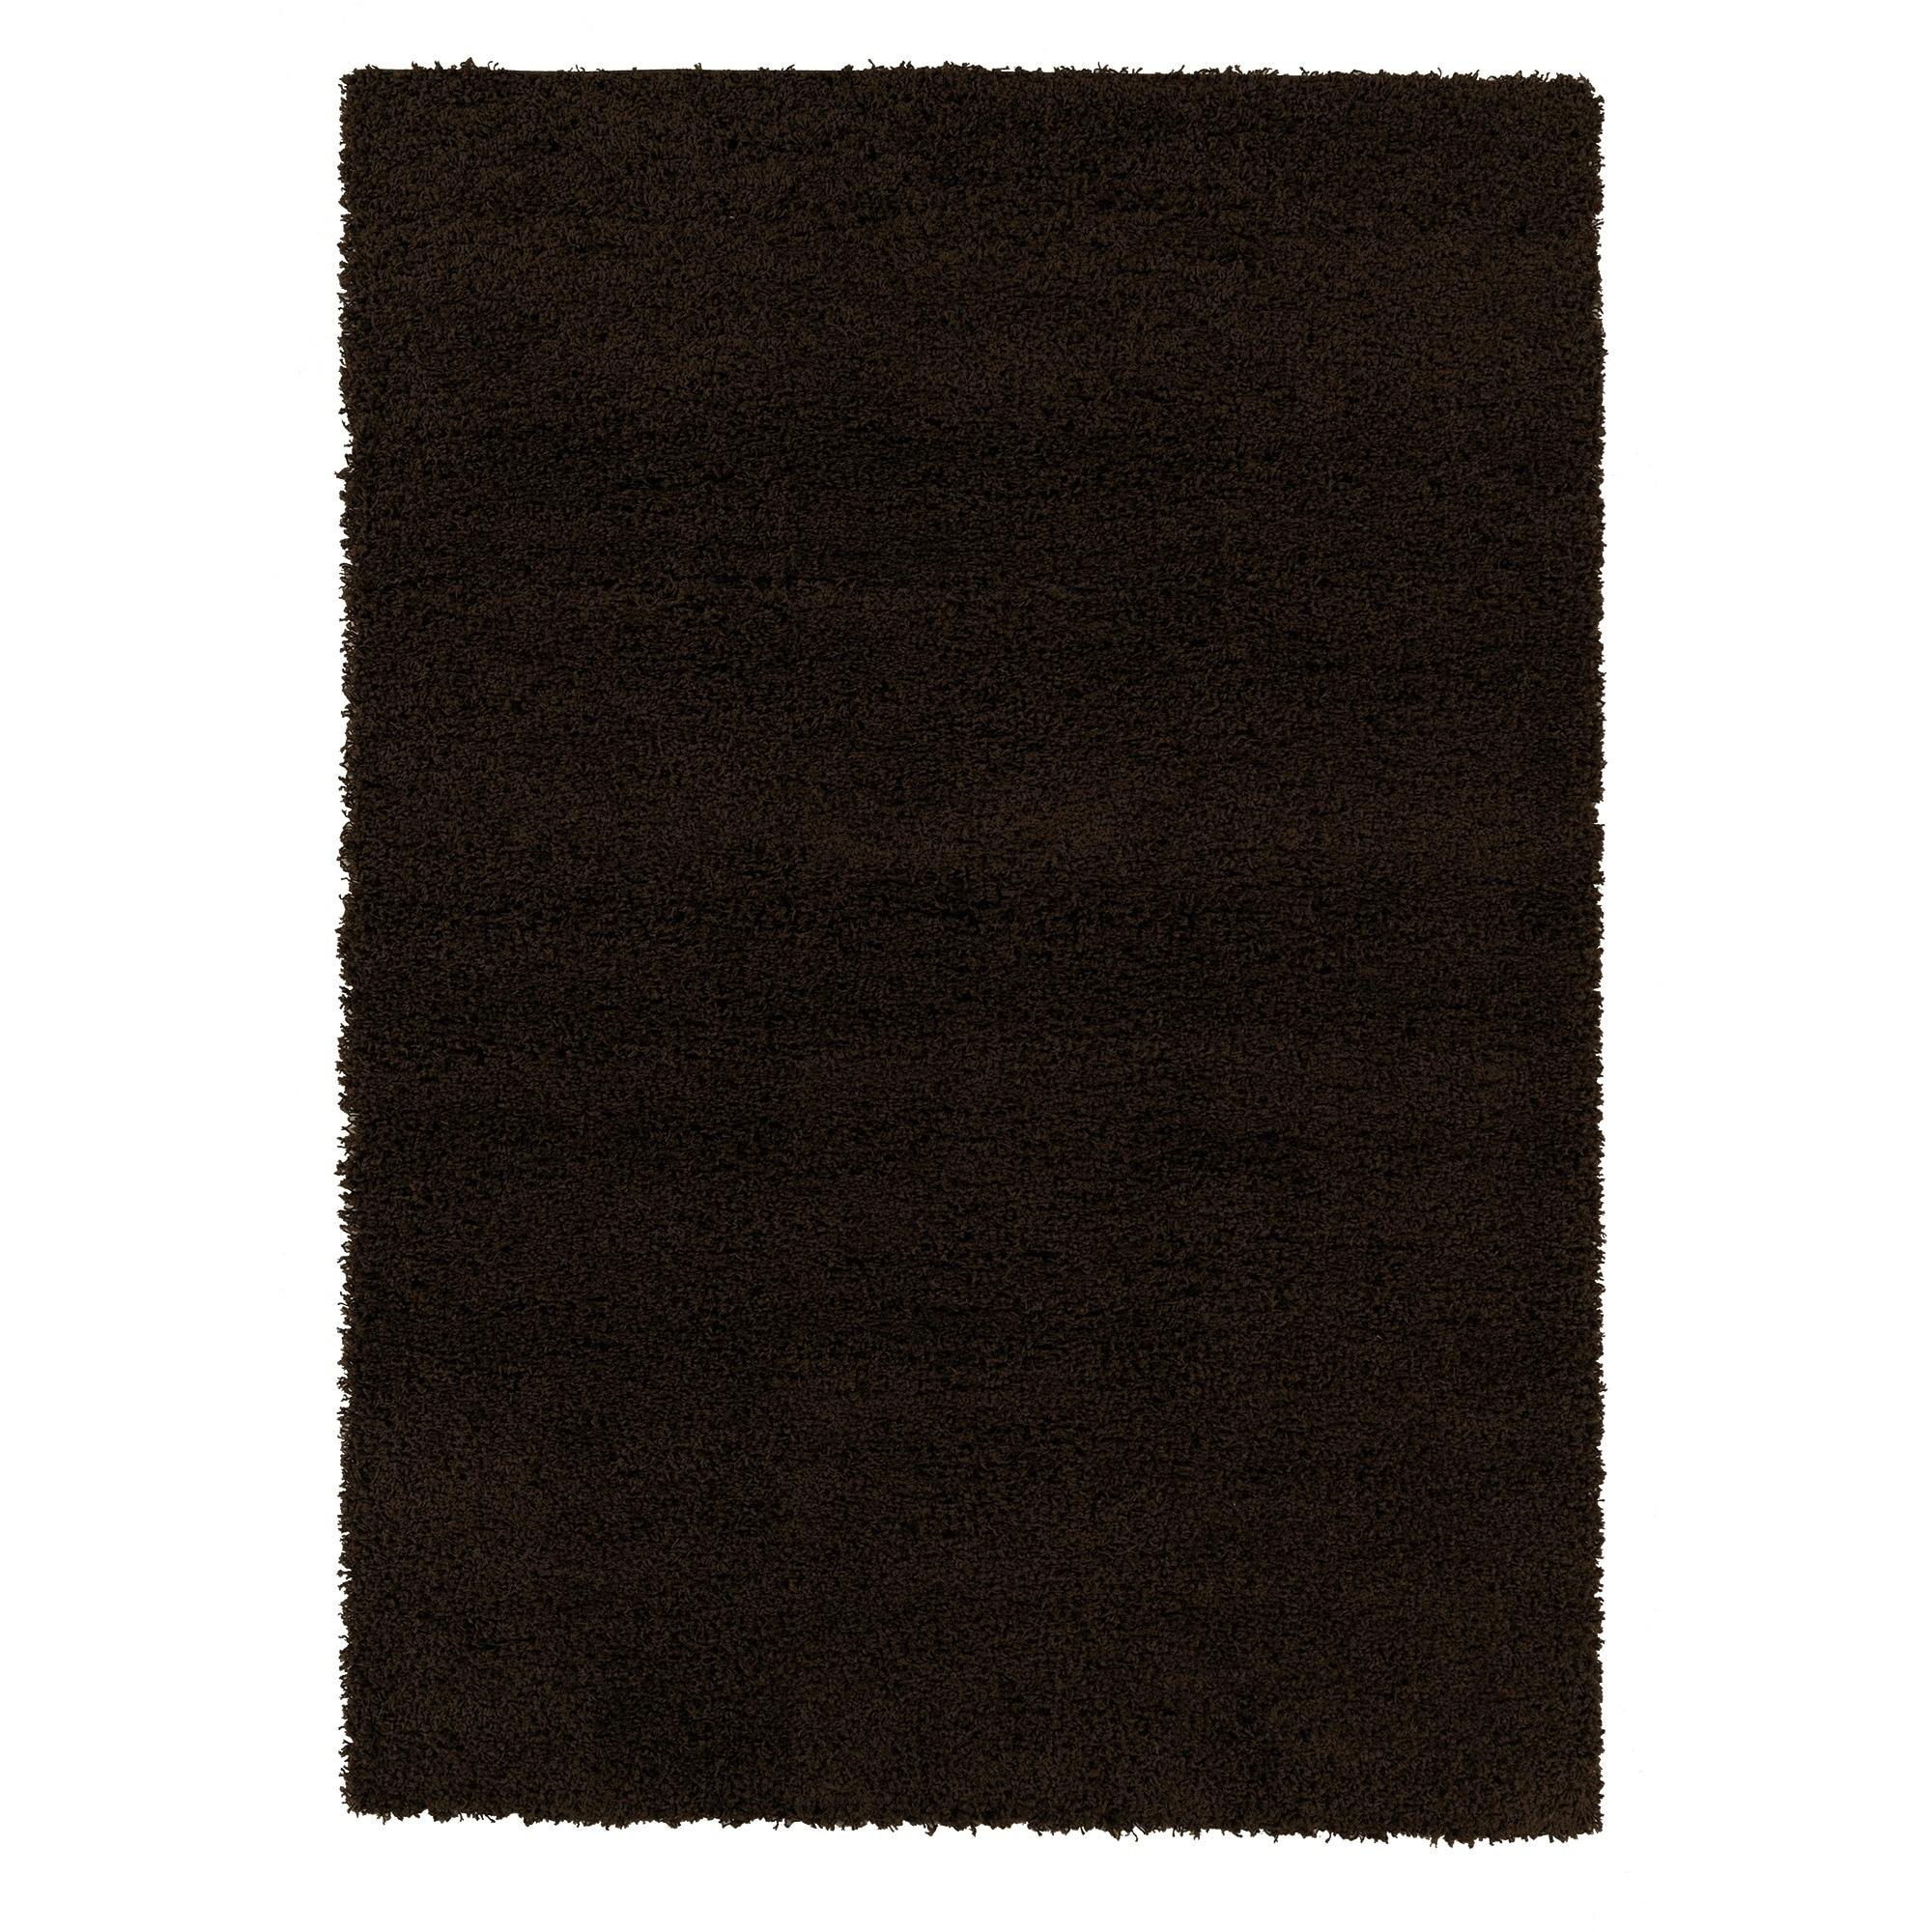 "Berrnour Home Berrland Solid Plush Soft Shag Living room & Bedroom Area Rug, 5'3"" X 7'0"", Navy"